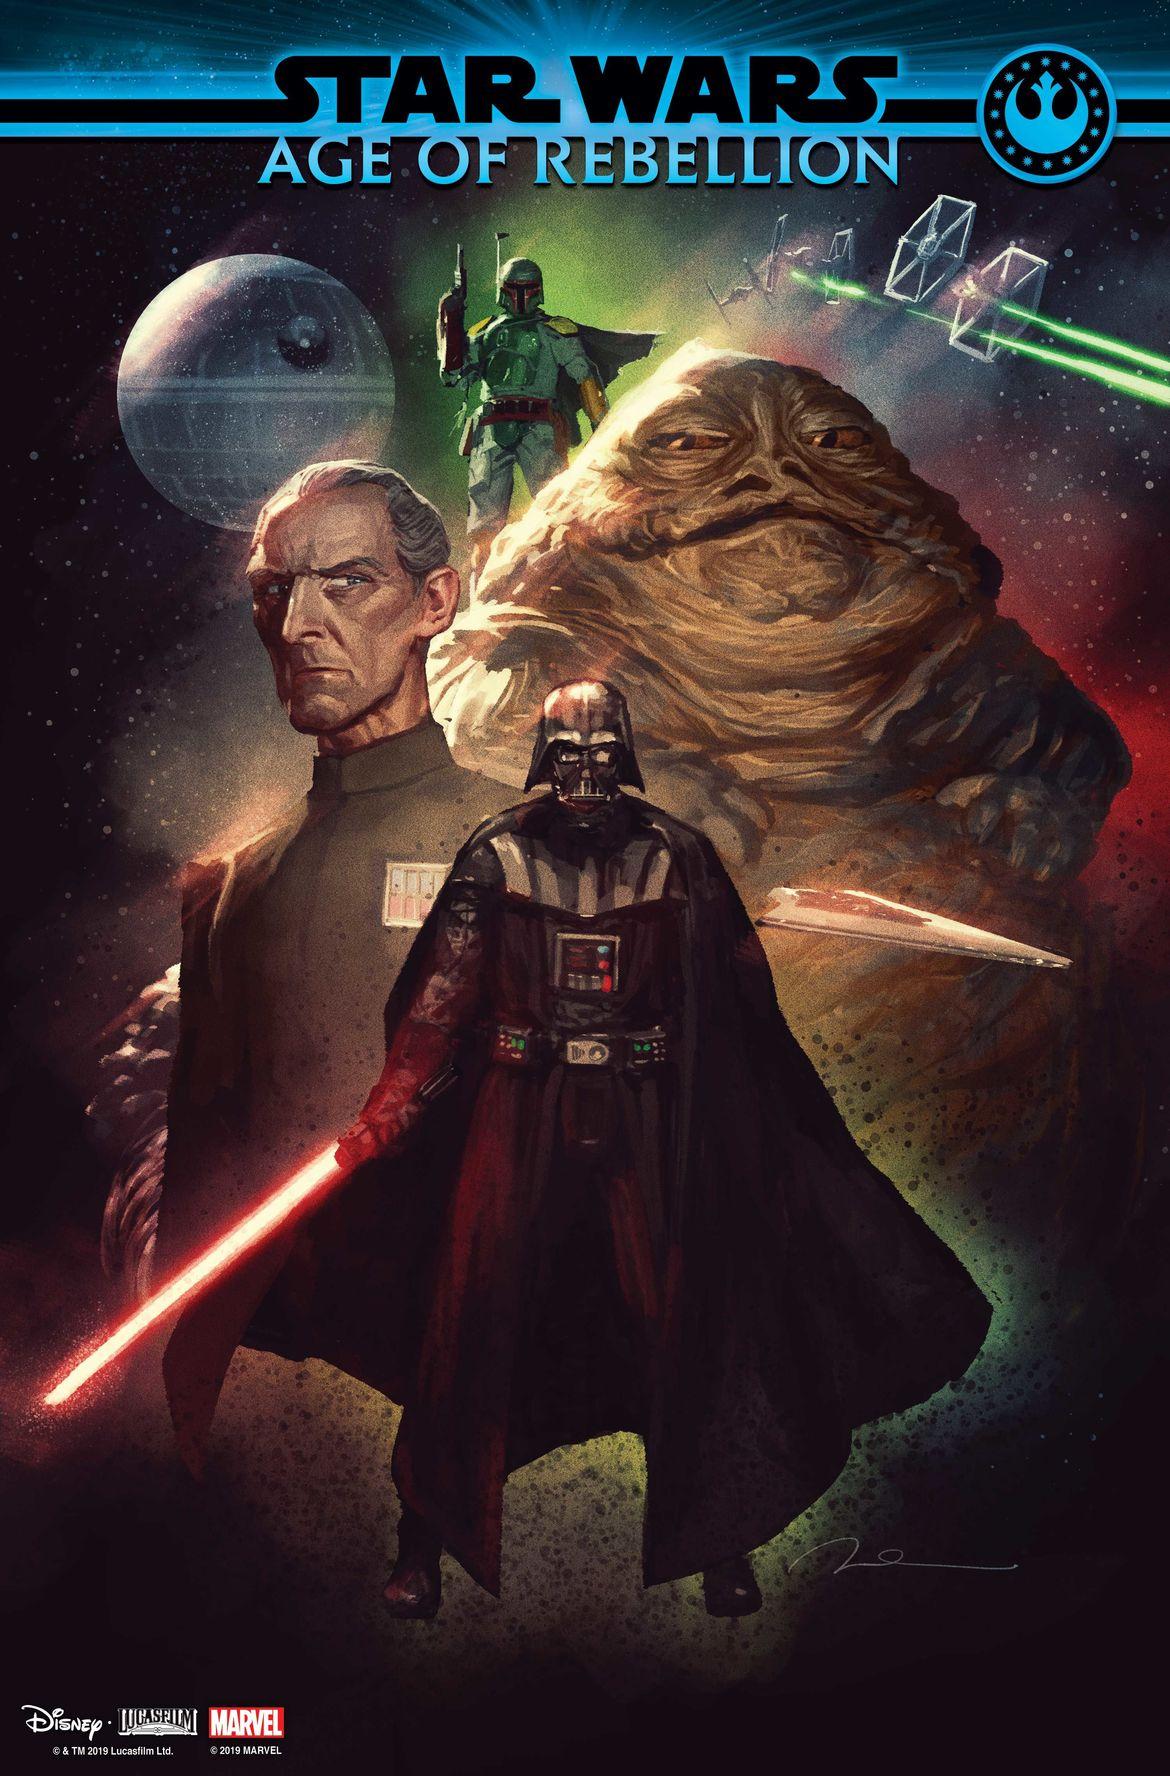 Star Wars: Age of Rebellion villain cover